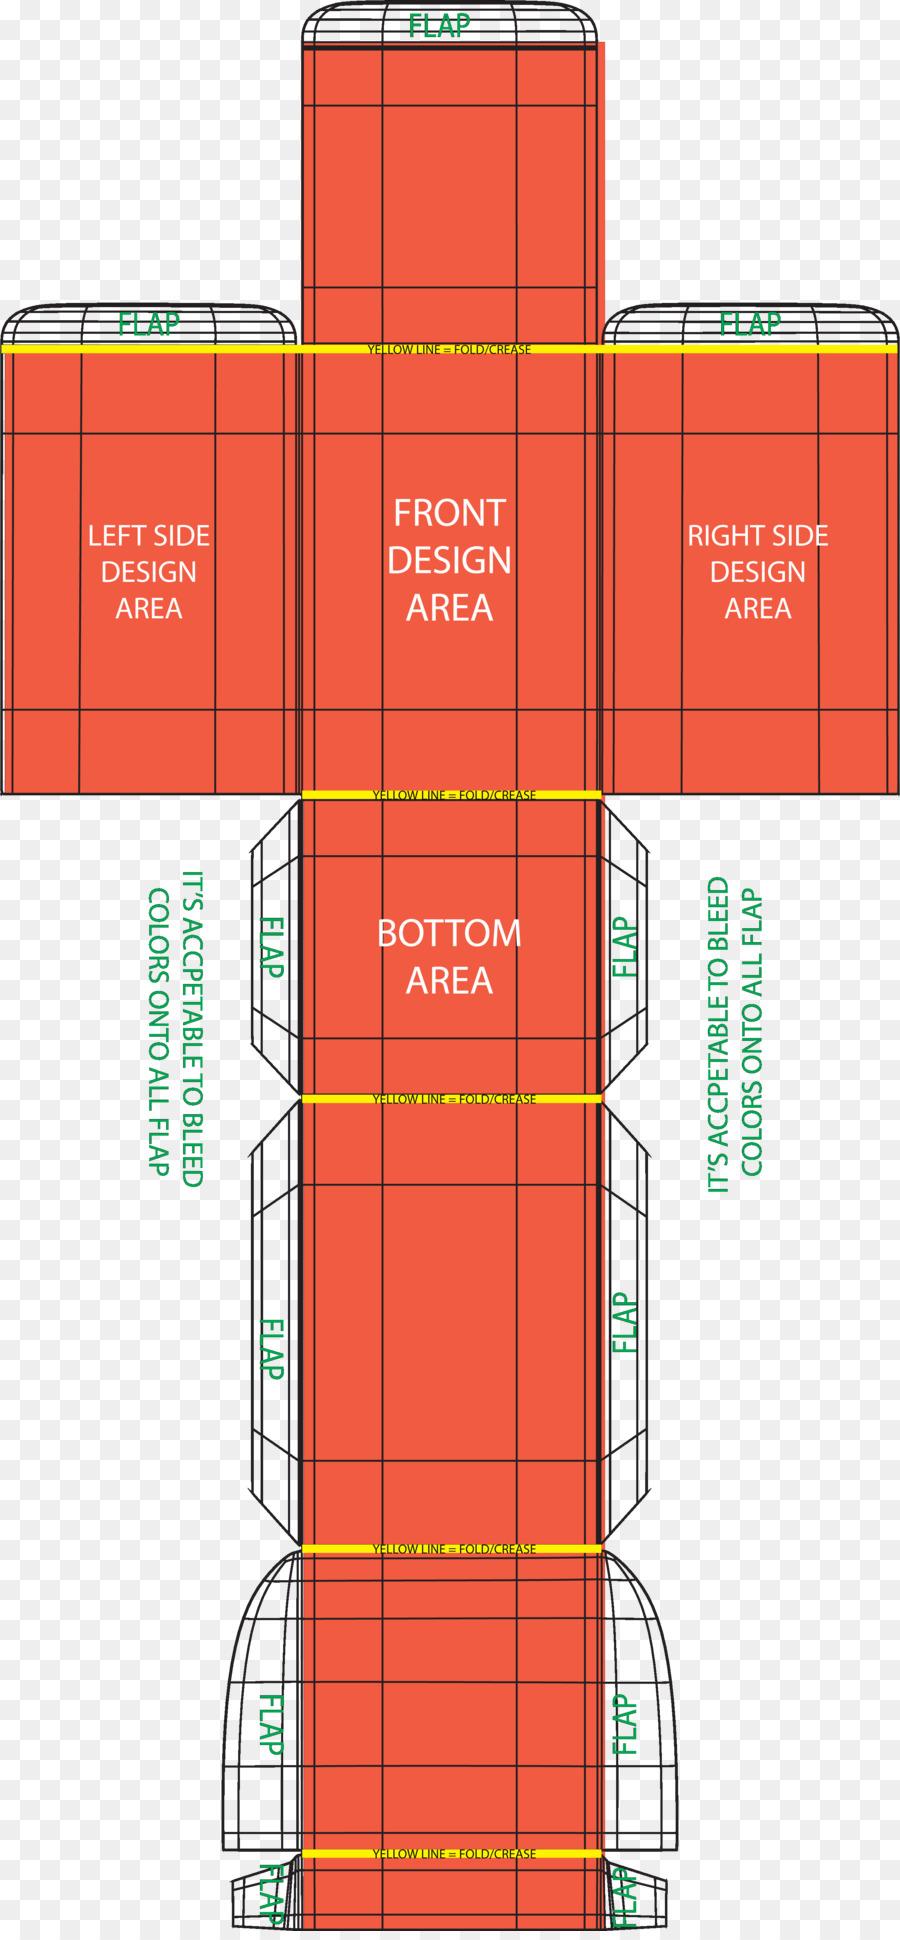 Box Packaging And Labeling Tea Bag Pattern Packaging Design